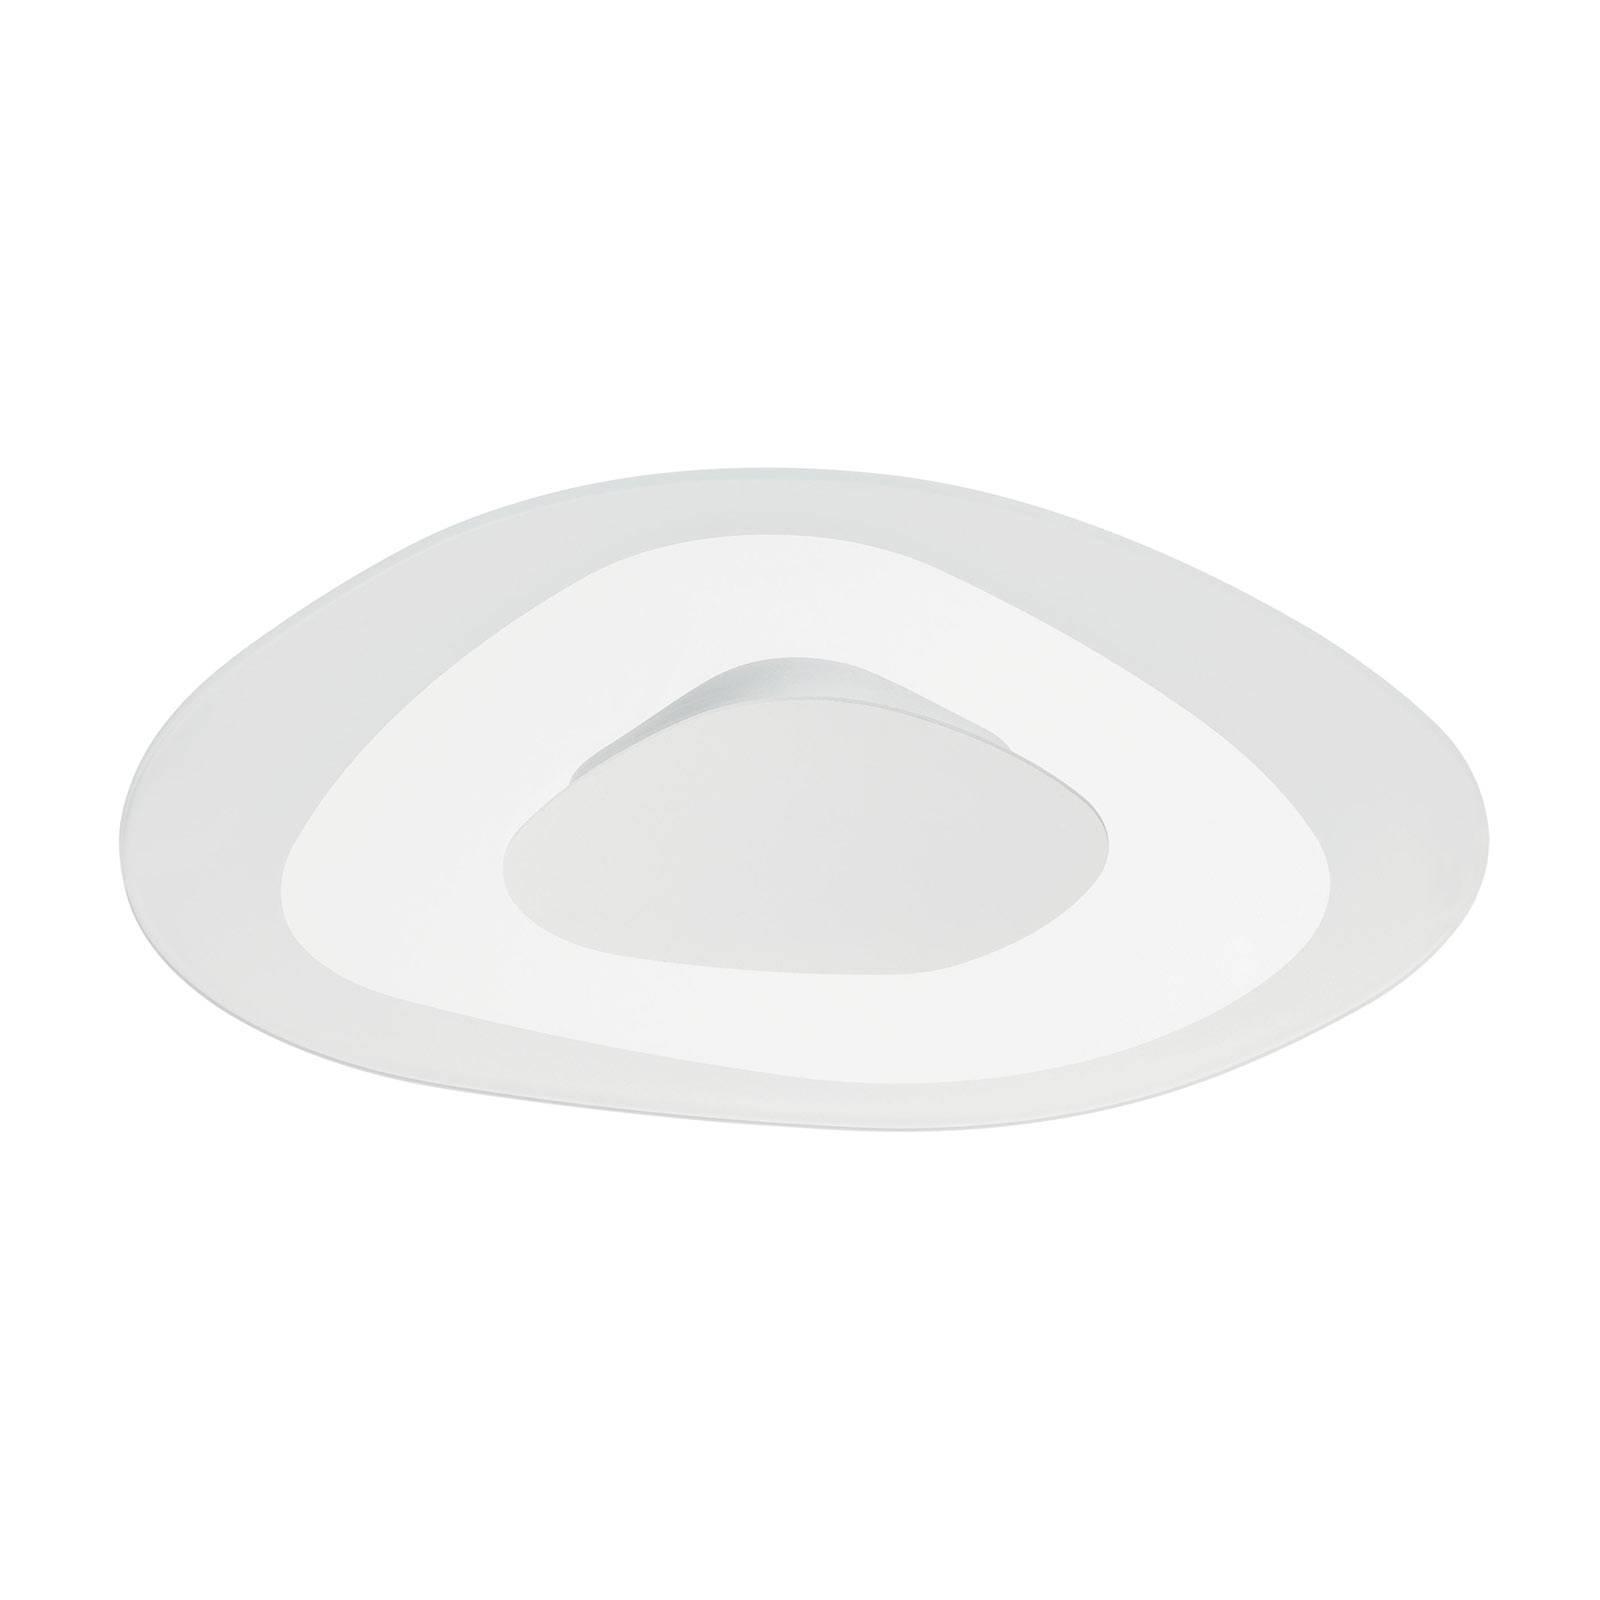 LED-Deckenleuchte Antigua S, 41 cm